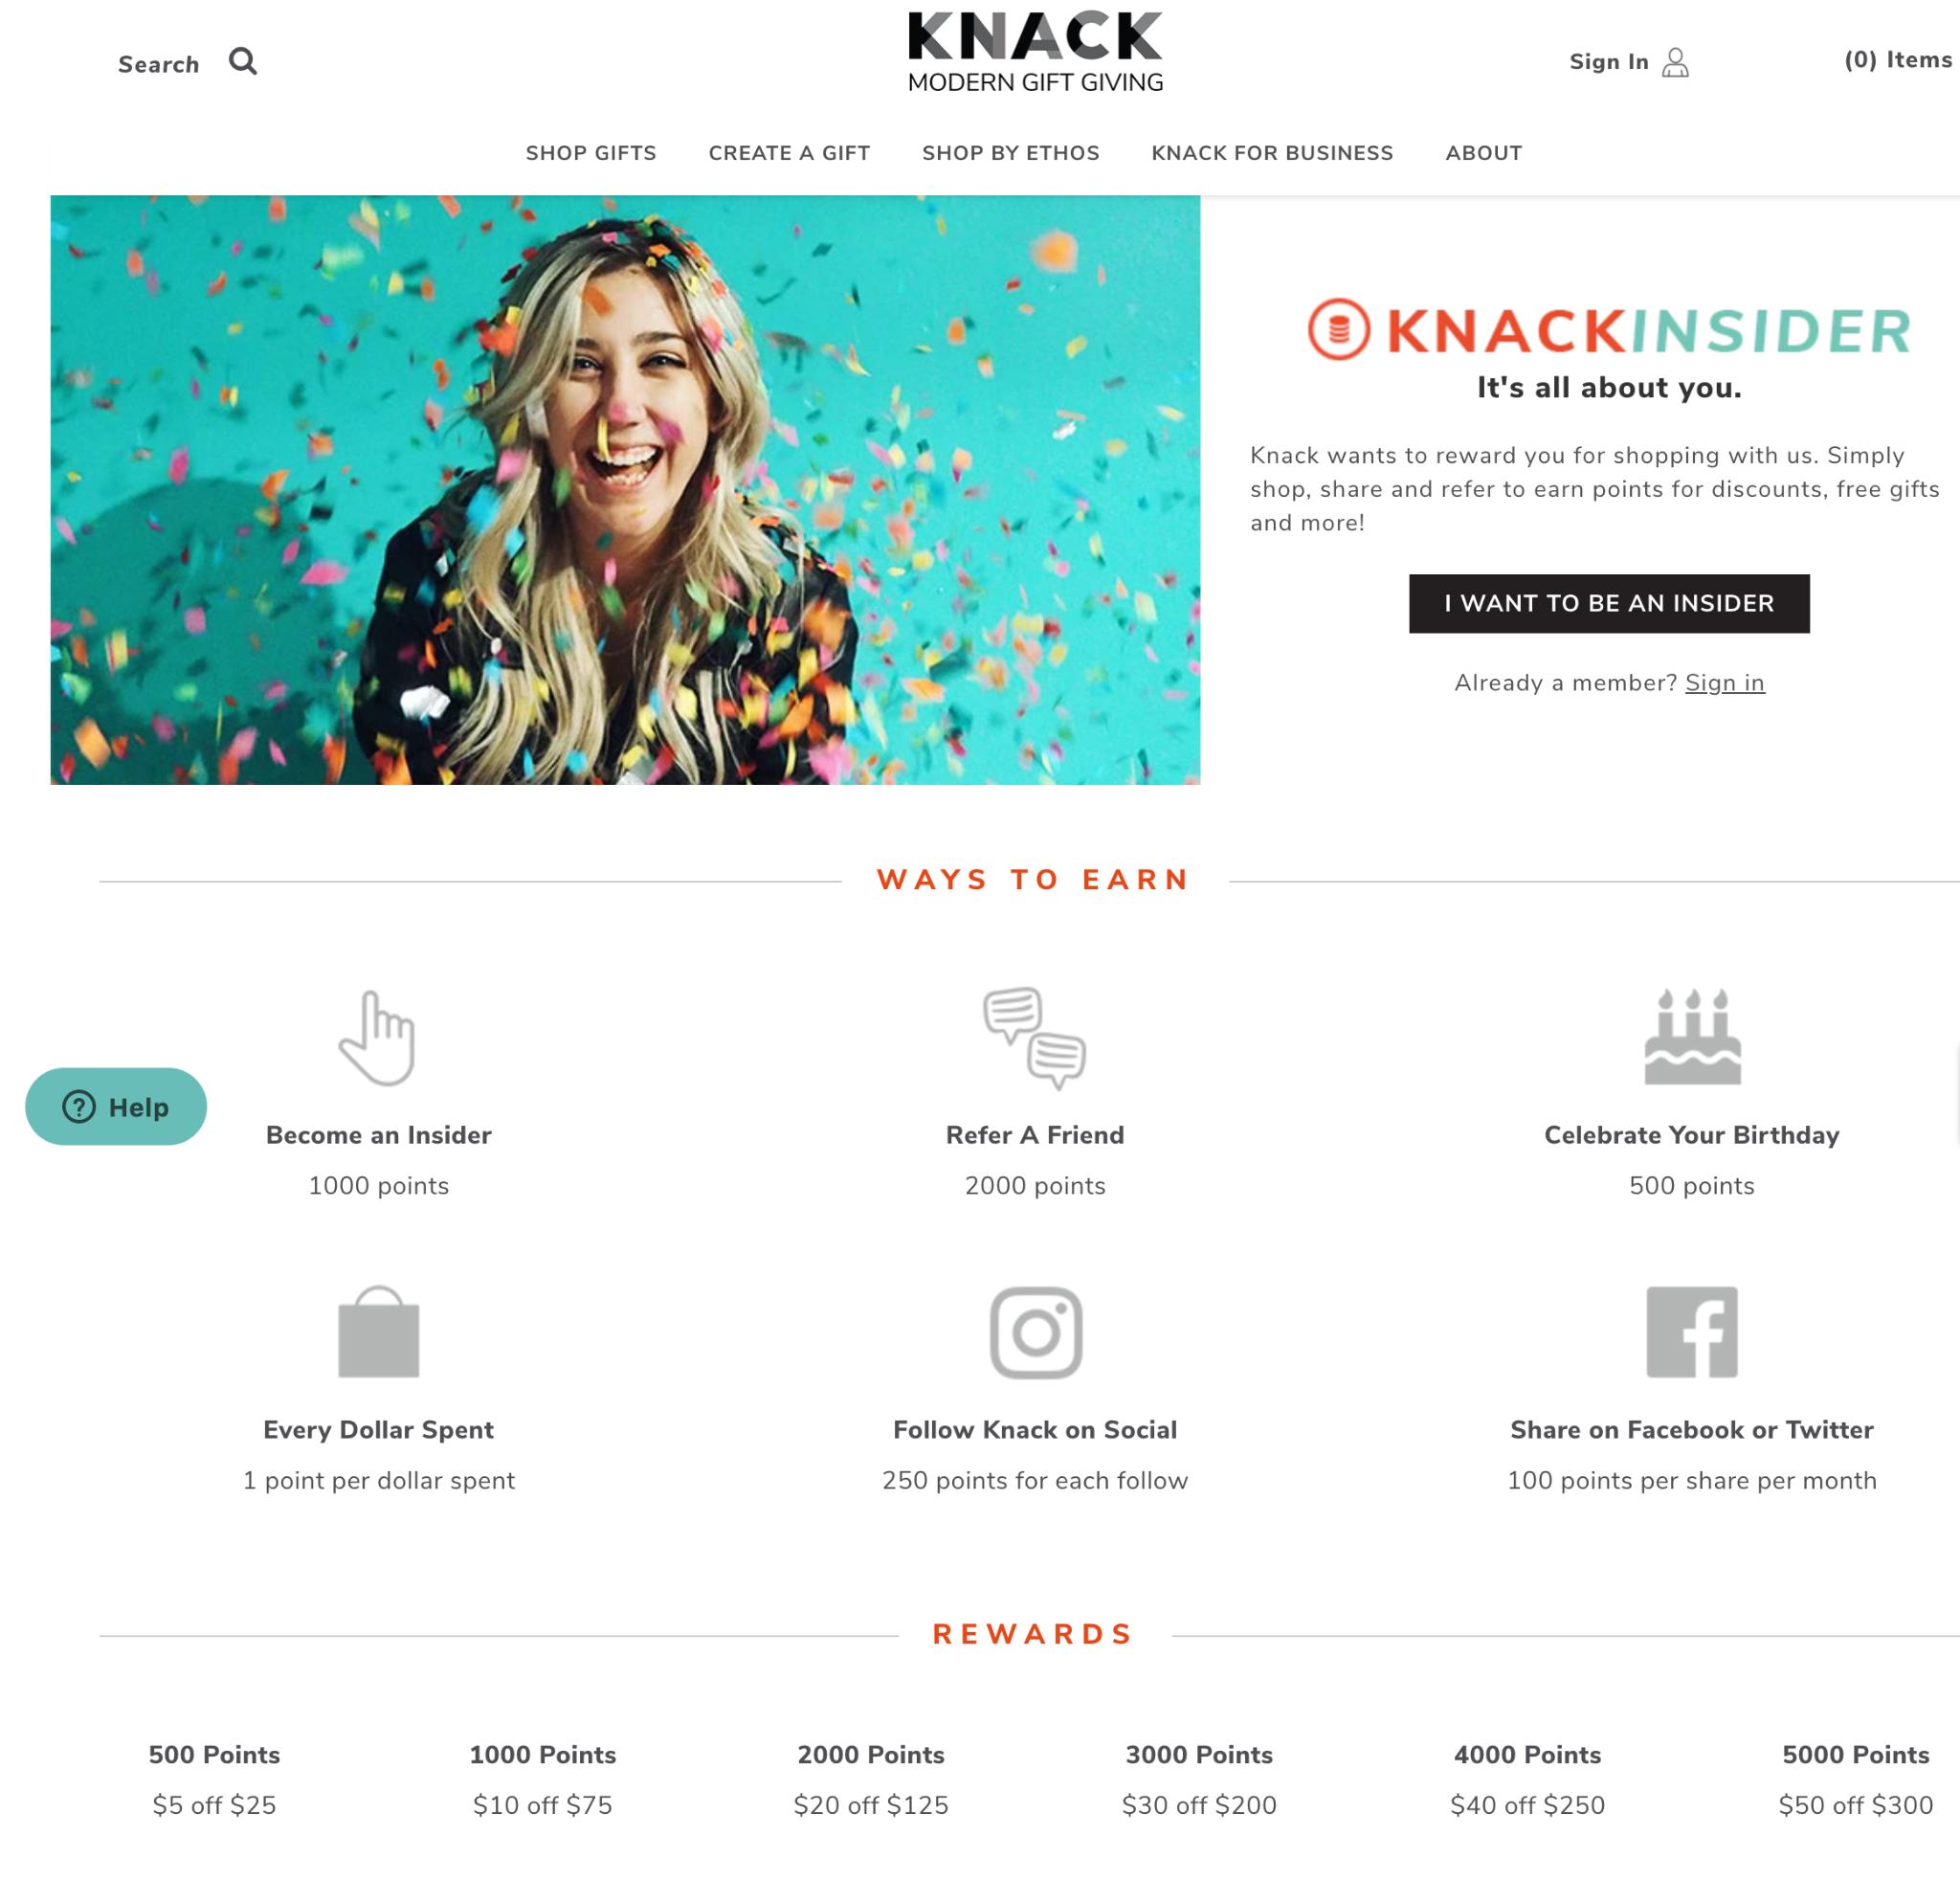 Knack Modern Gift Giving Knack Insider Rewards Explainer Page